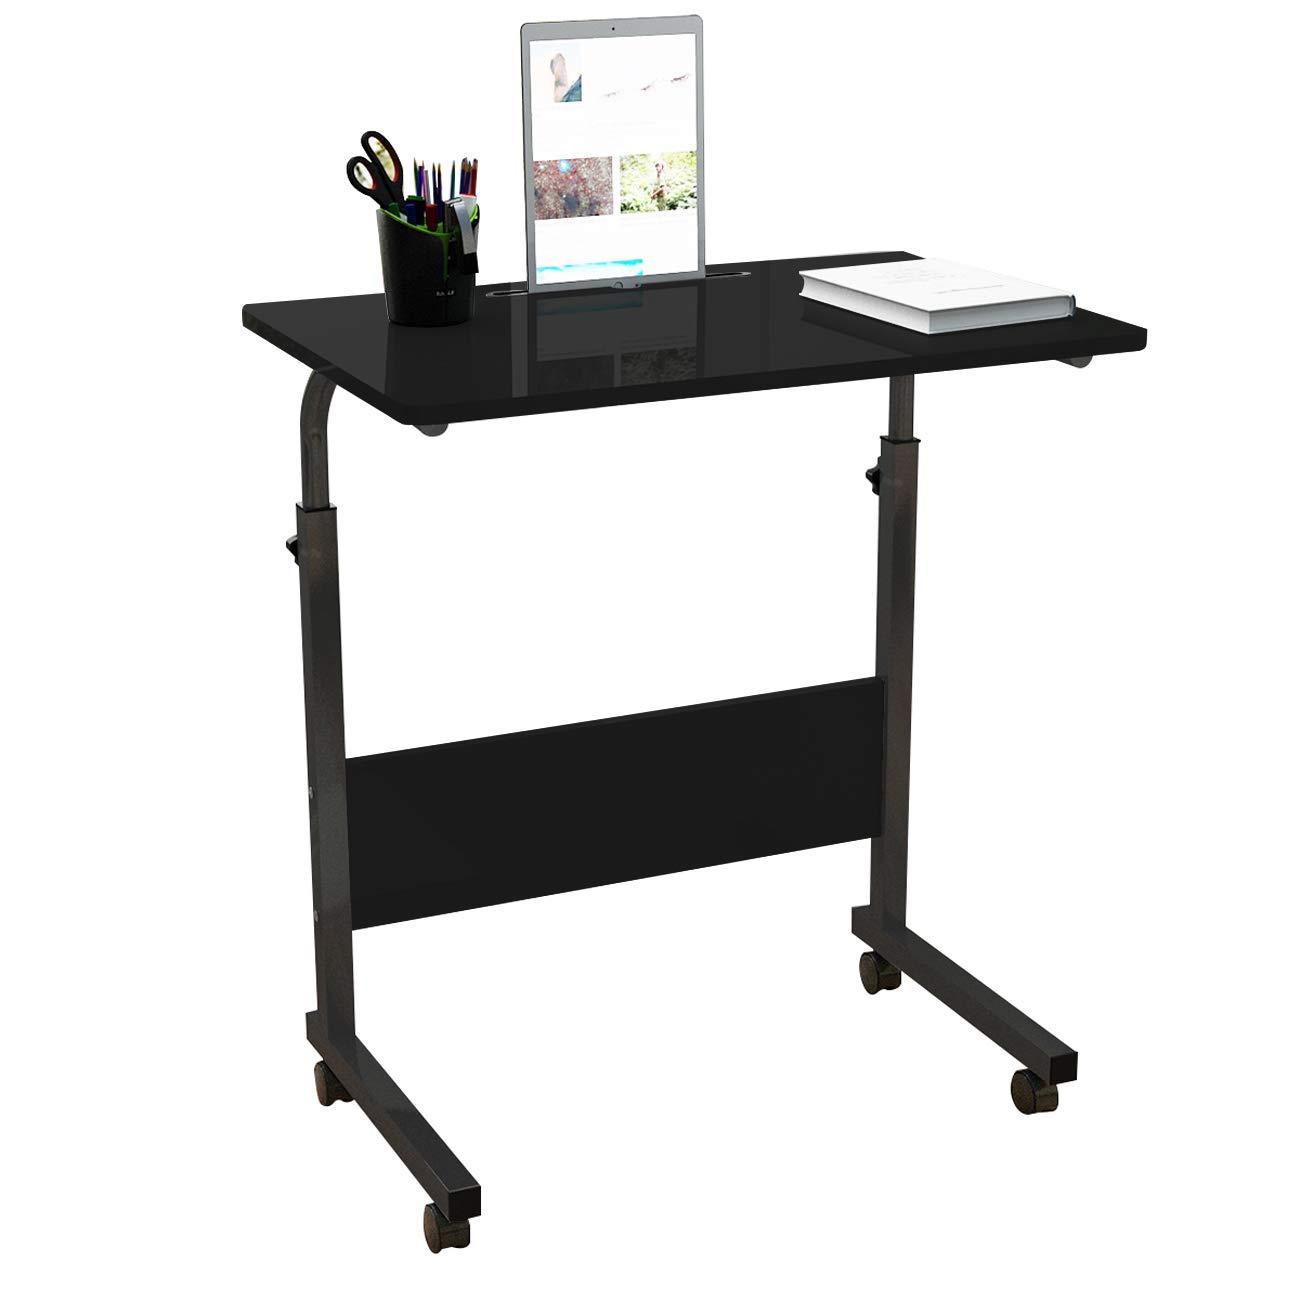 SogesHome 23.6 inch Adjustable Mobile Bed Table Portable Laptop Computer Stand Desks with Tablet Slot Cart Tray, Black, NSDUS-05-3-60BK